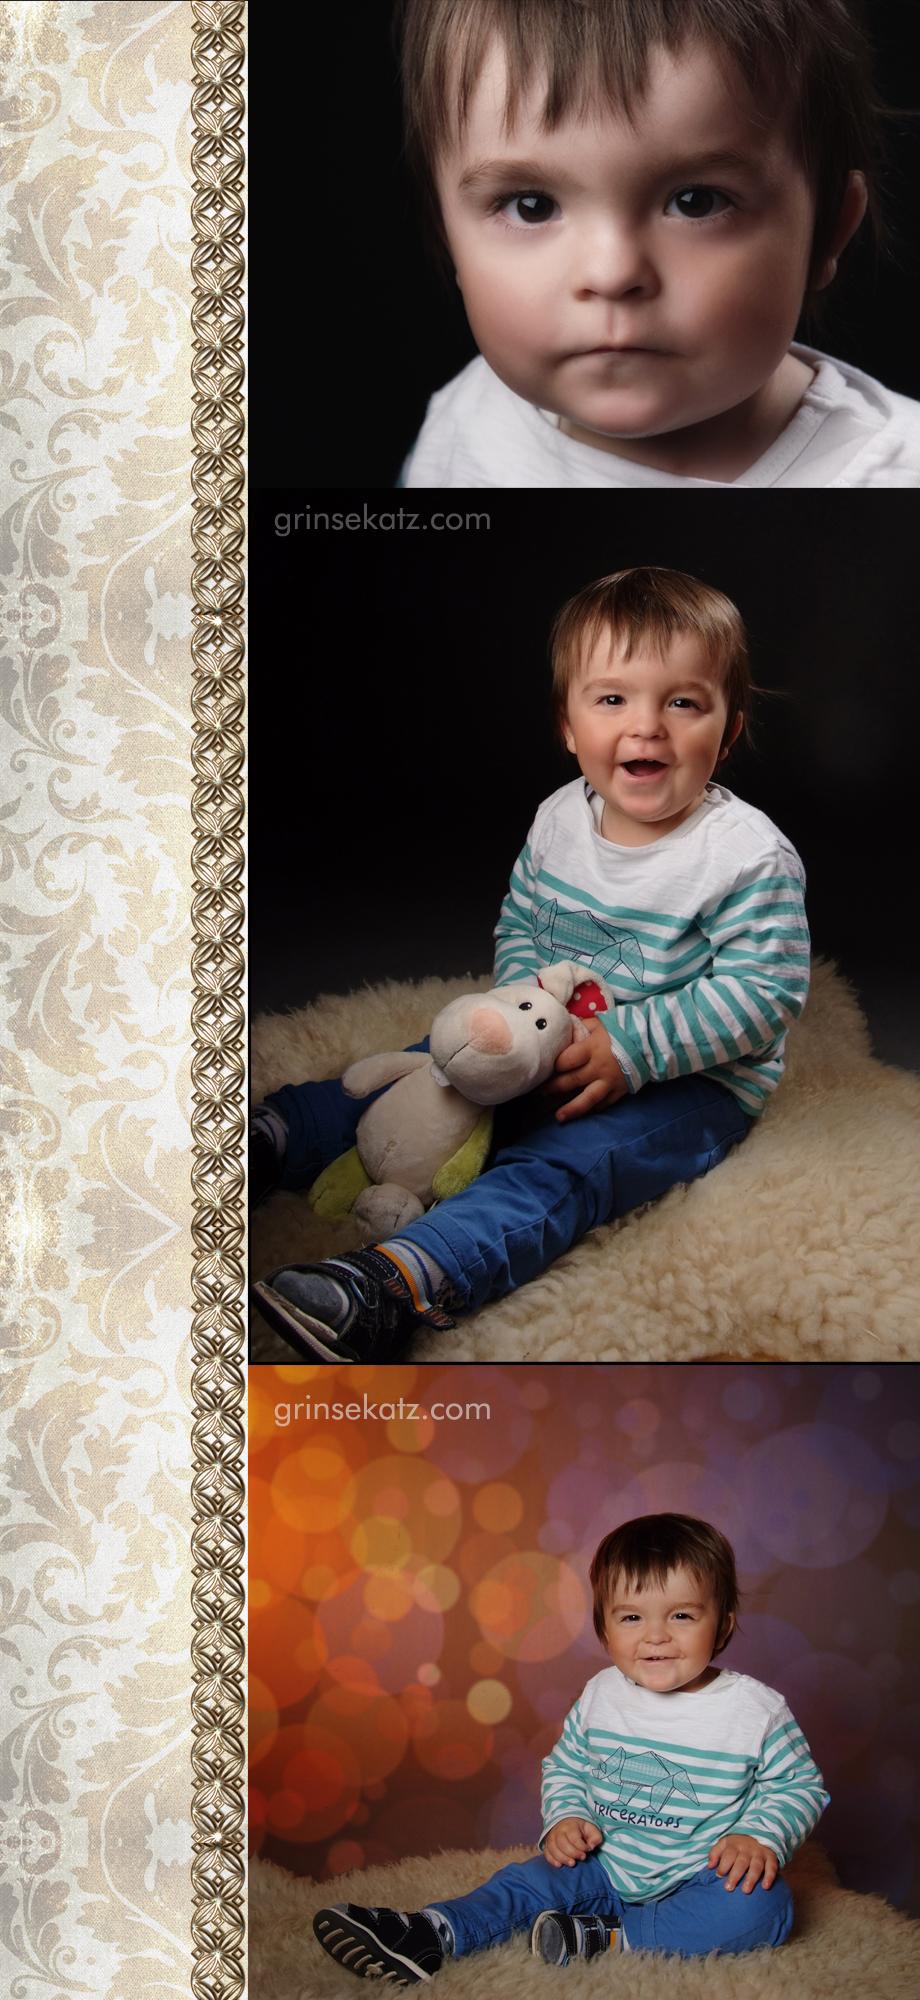 Kinderfotograf Templin Grinsekatz